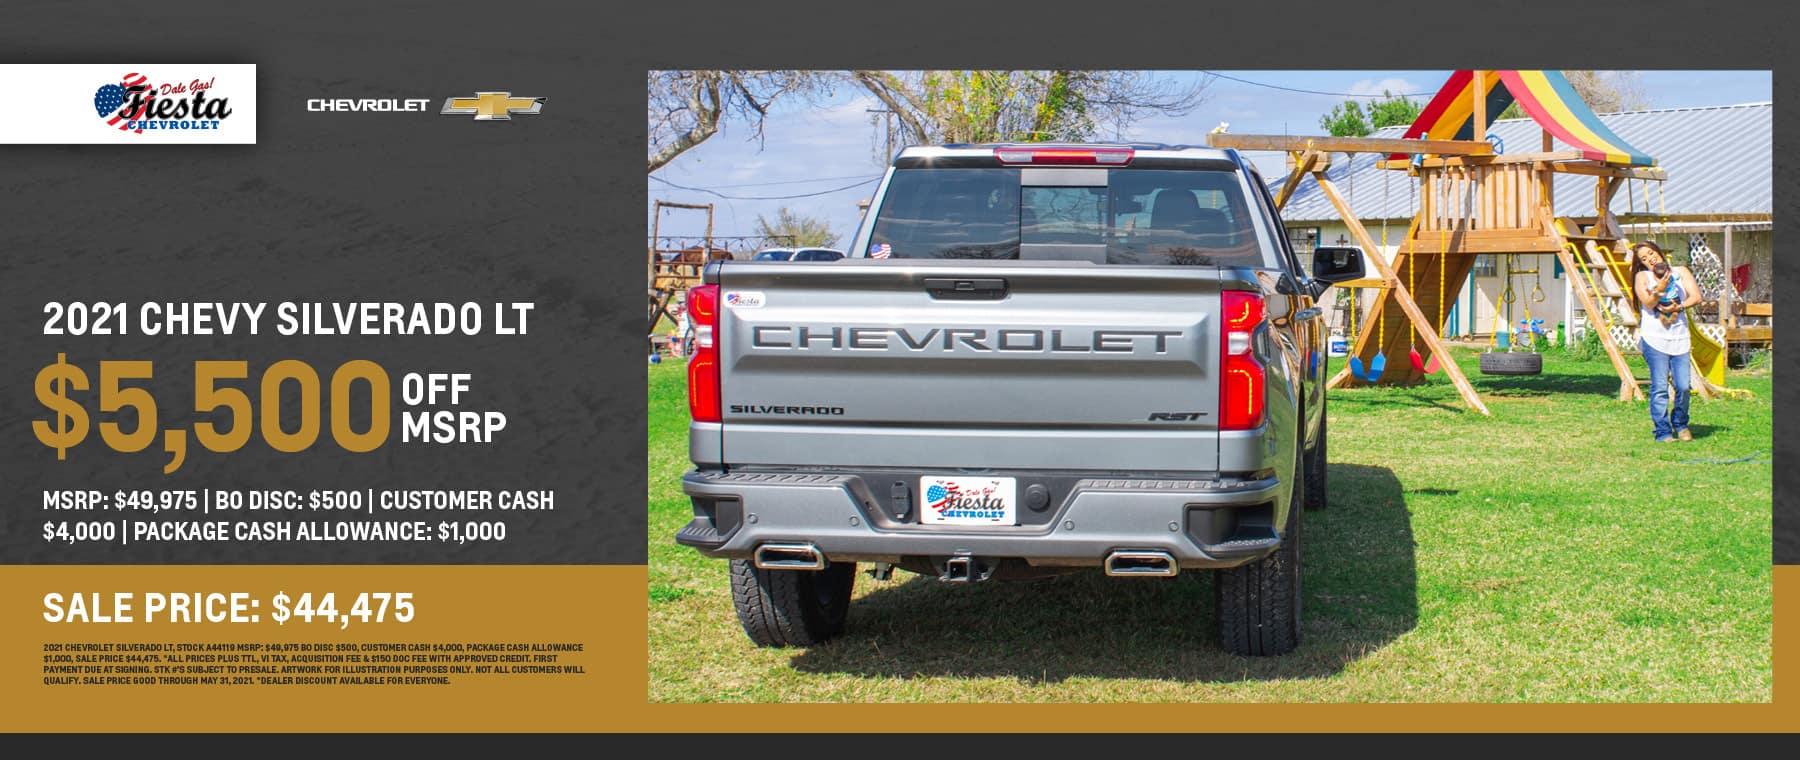 2021 Chevrolet Silverado 1500 LT - Fiesta Chevrolet in Edinburg, Texas